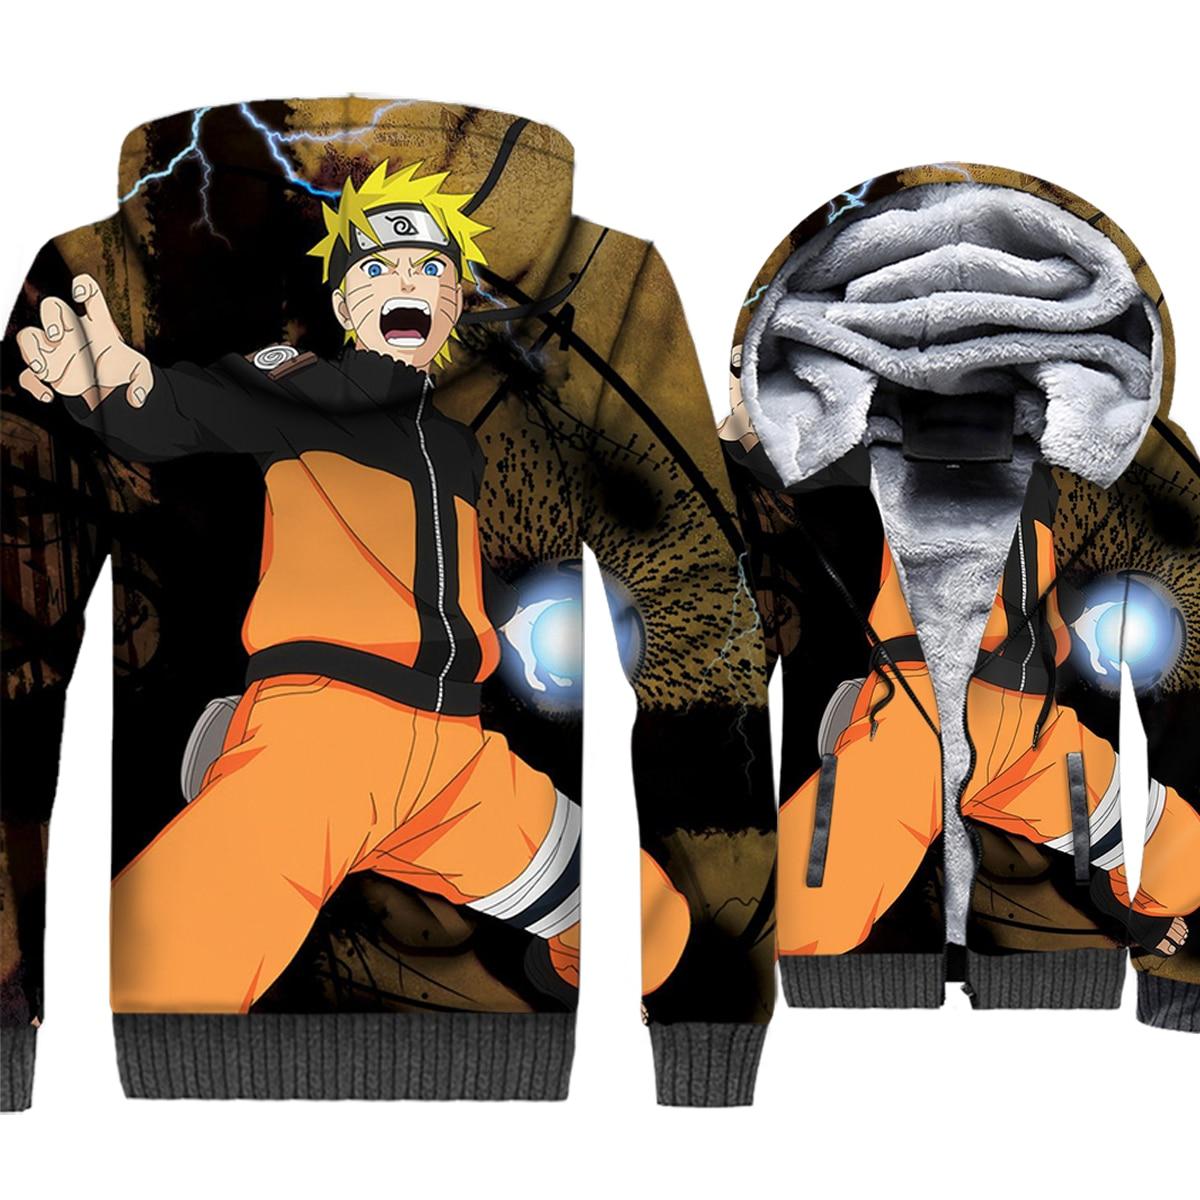 Naruto Uzumaki 3D Hoodies Men Japan Anime Harajuku Sweatshirt Winter Thick Fleece Zipper Coat Hipster Jacket Hip Hop Streetwear